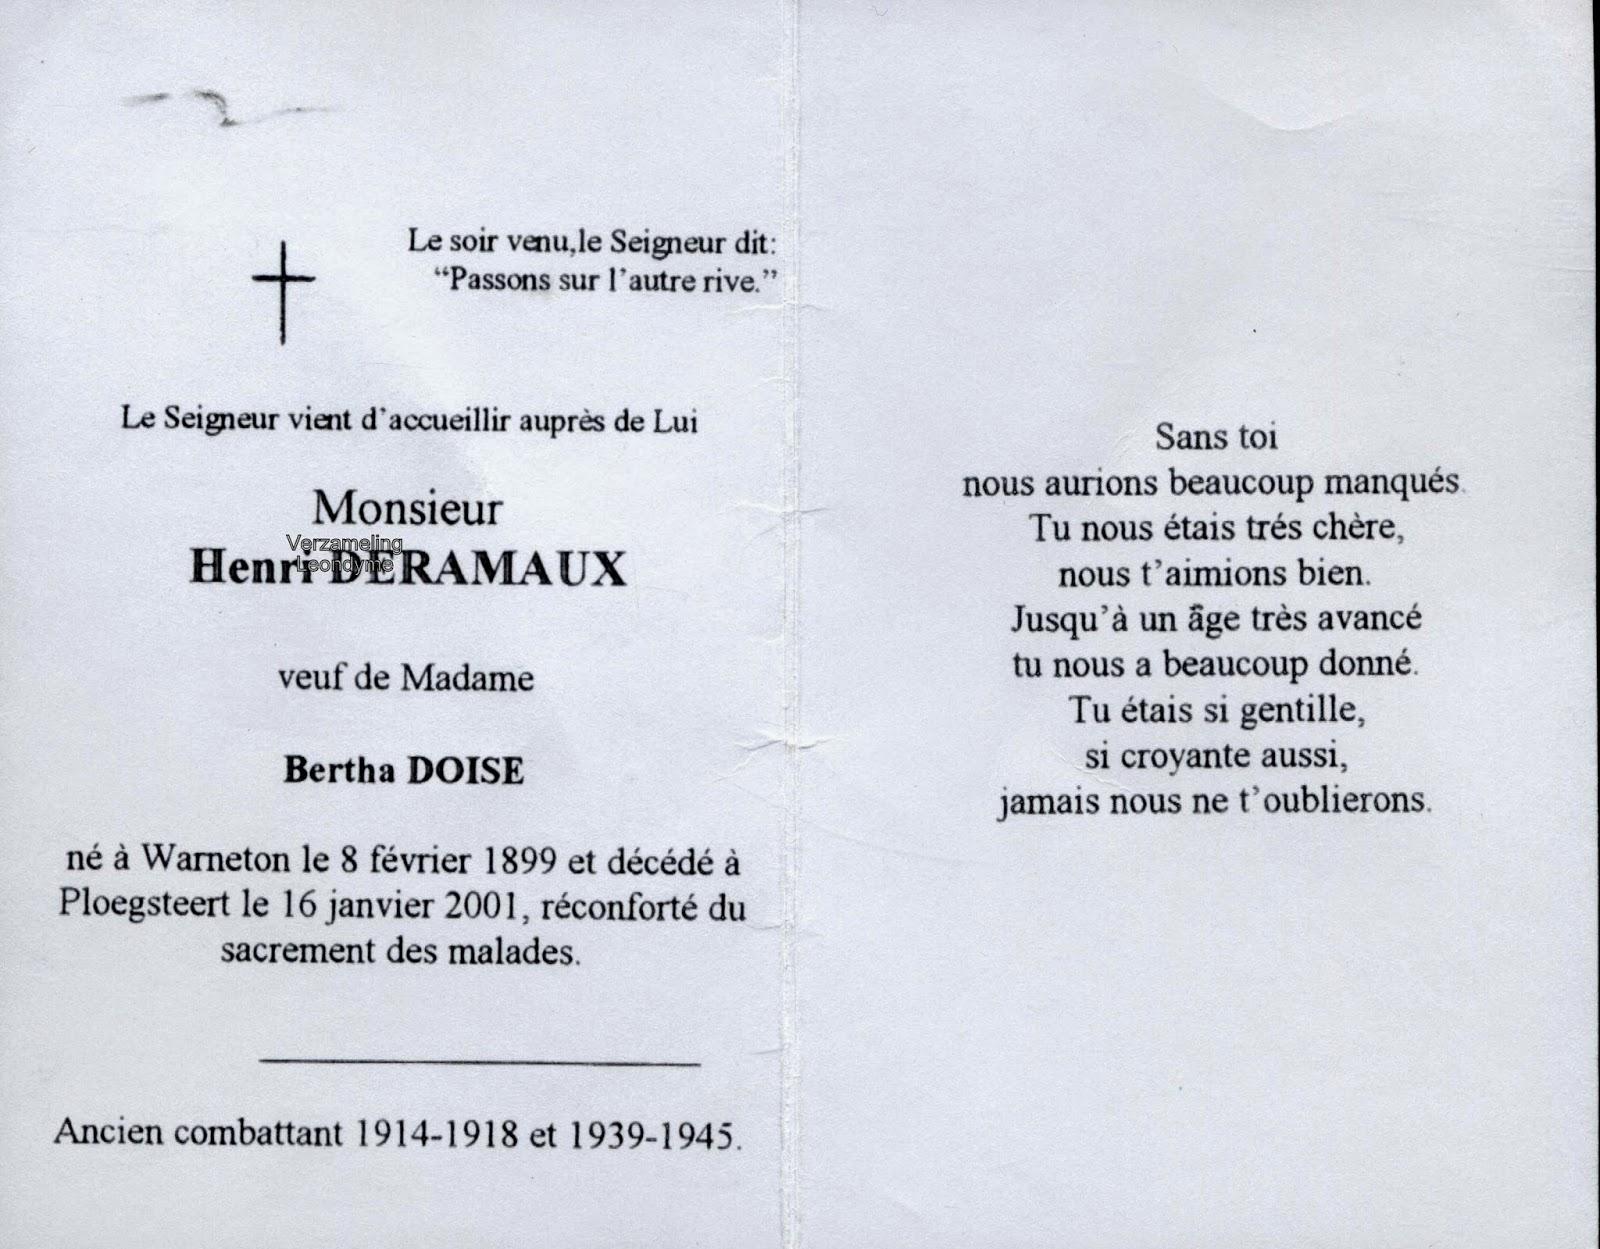 Bidprentje Henri Deramaux 1899-2001. Verzameling Leondyme